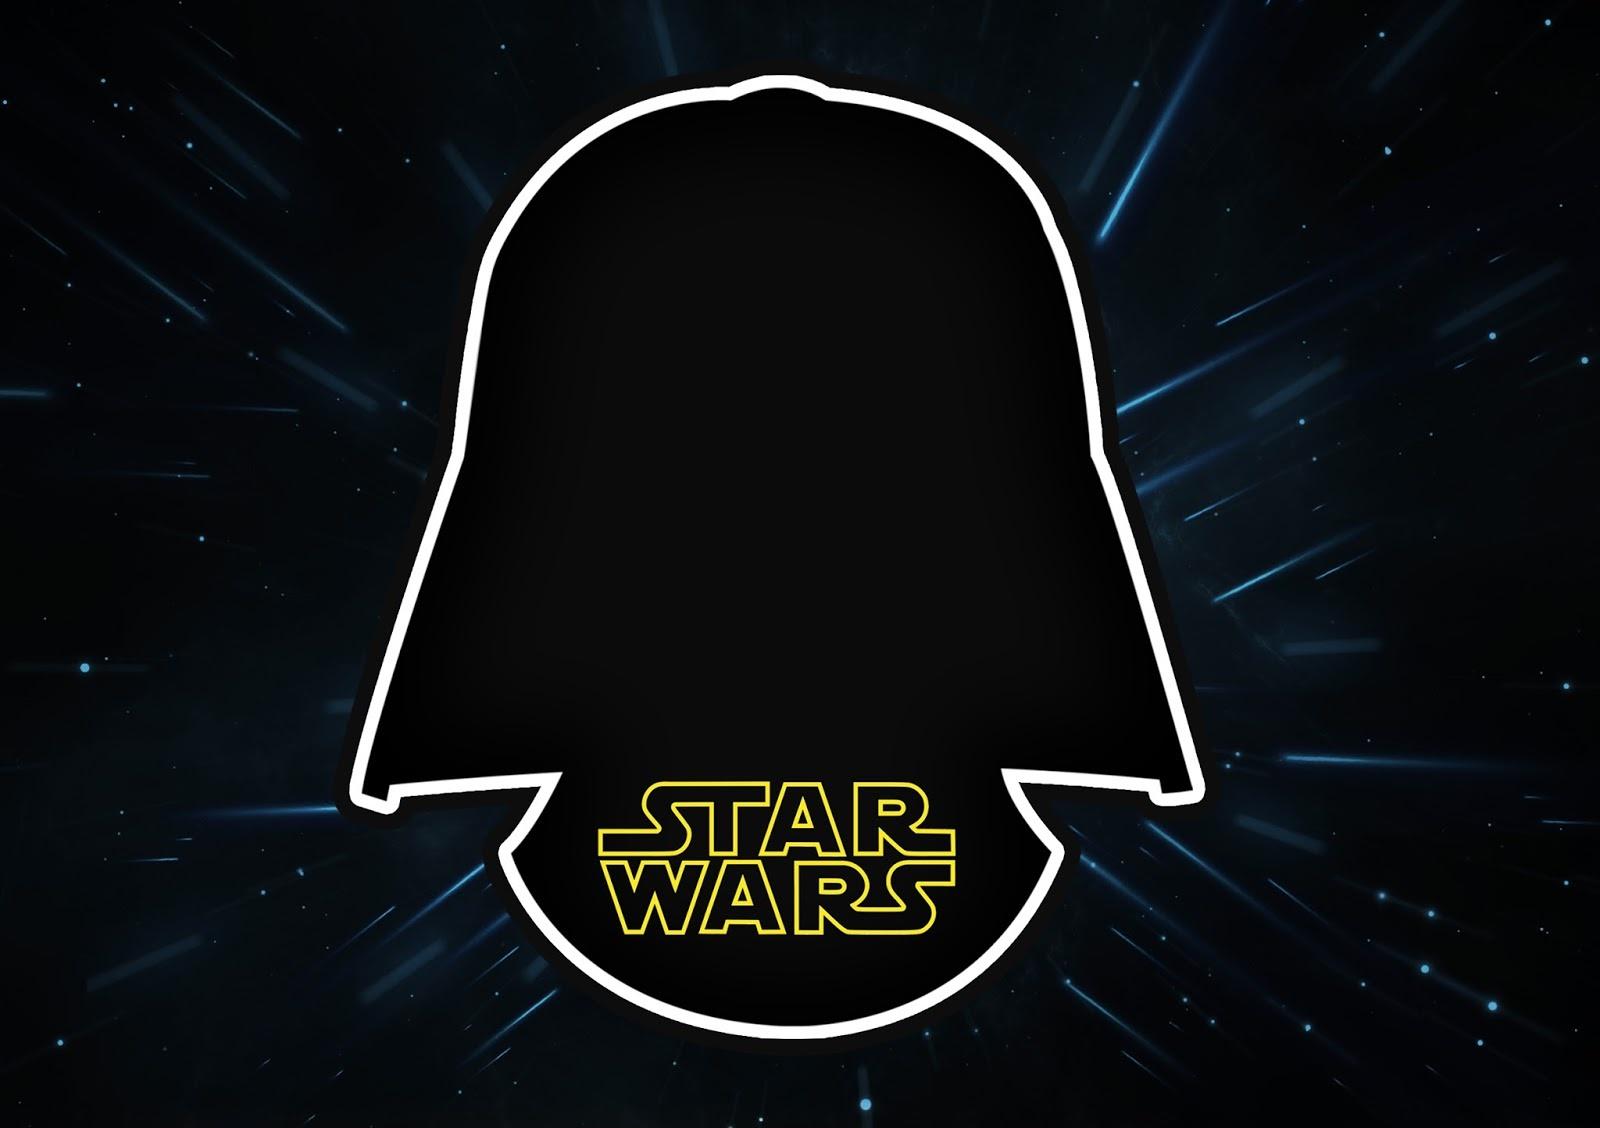 Star Wars: Free Printable Invitations. - Oh My Fiesta! For Geeks - Star Wars Invitations Free Printable